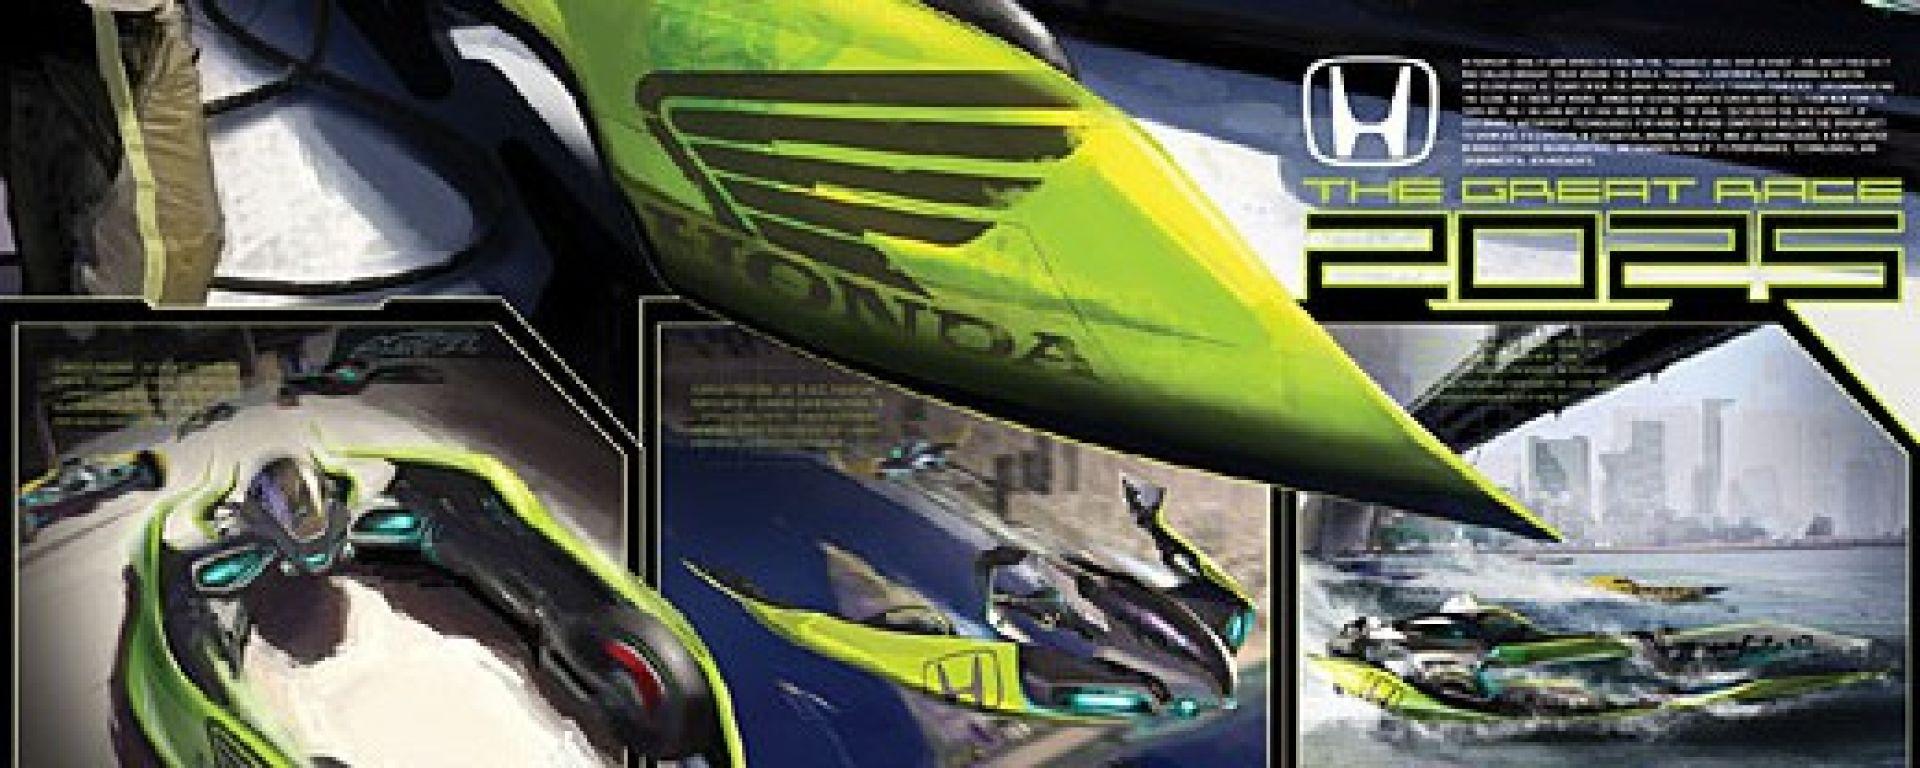 Le Sportcar del 2025